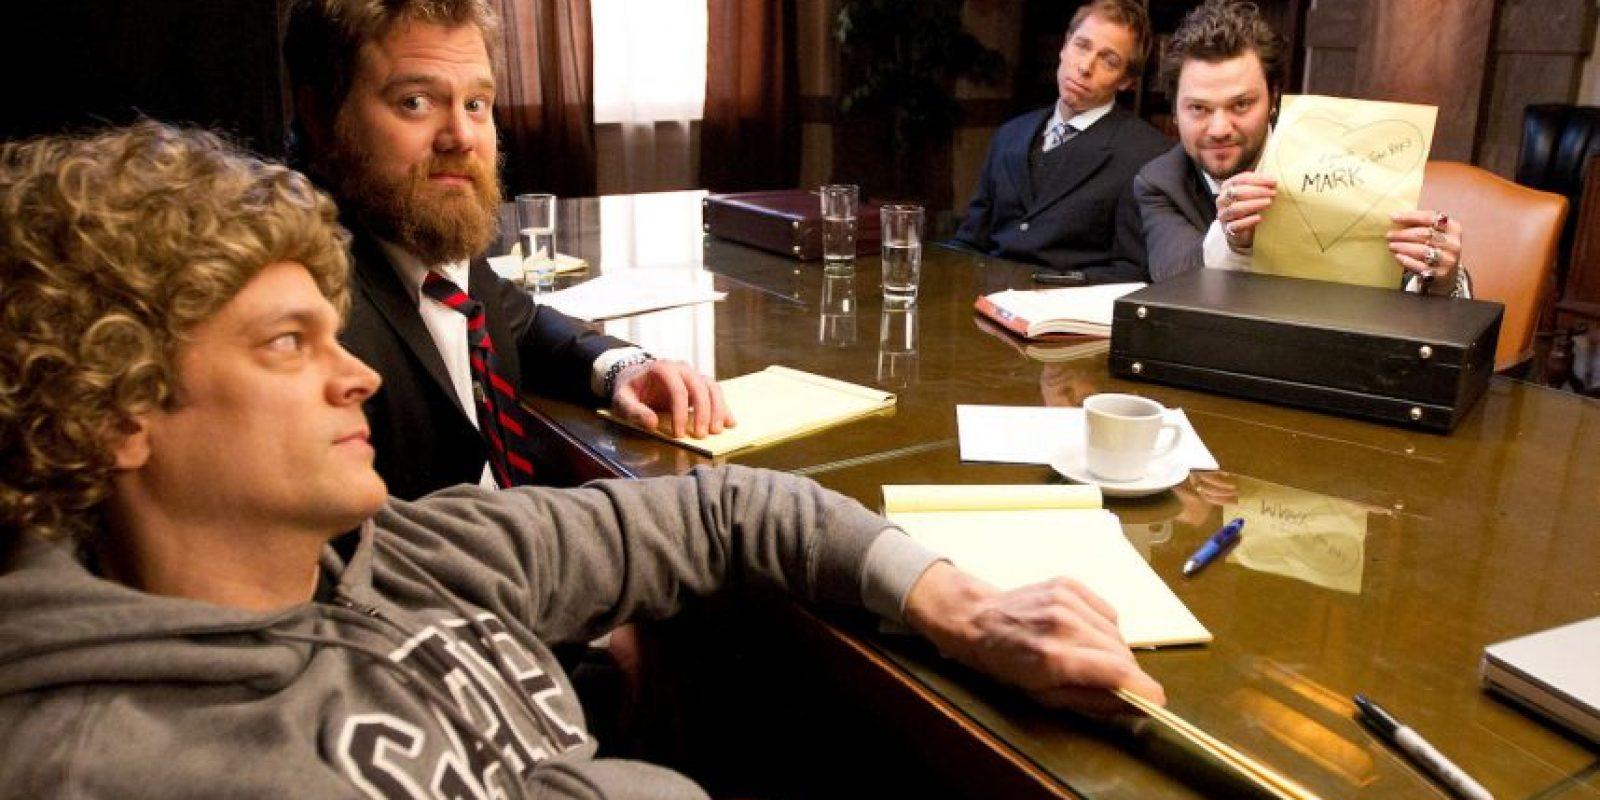 Dunn participó en las escenas de acción que hizo a Jackass famoso. Foto:Getty Images